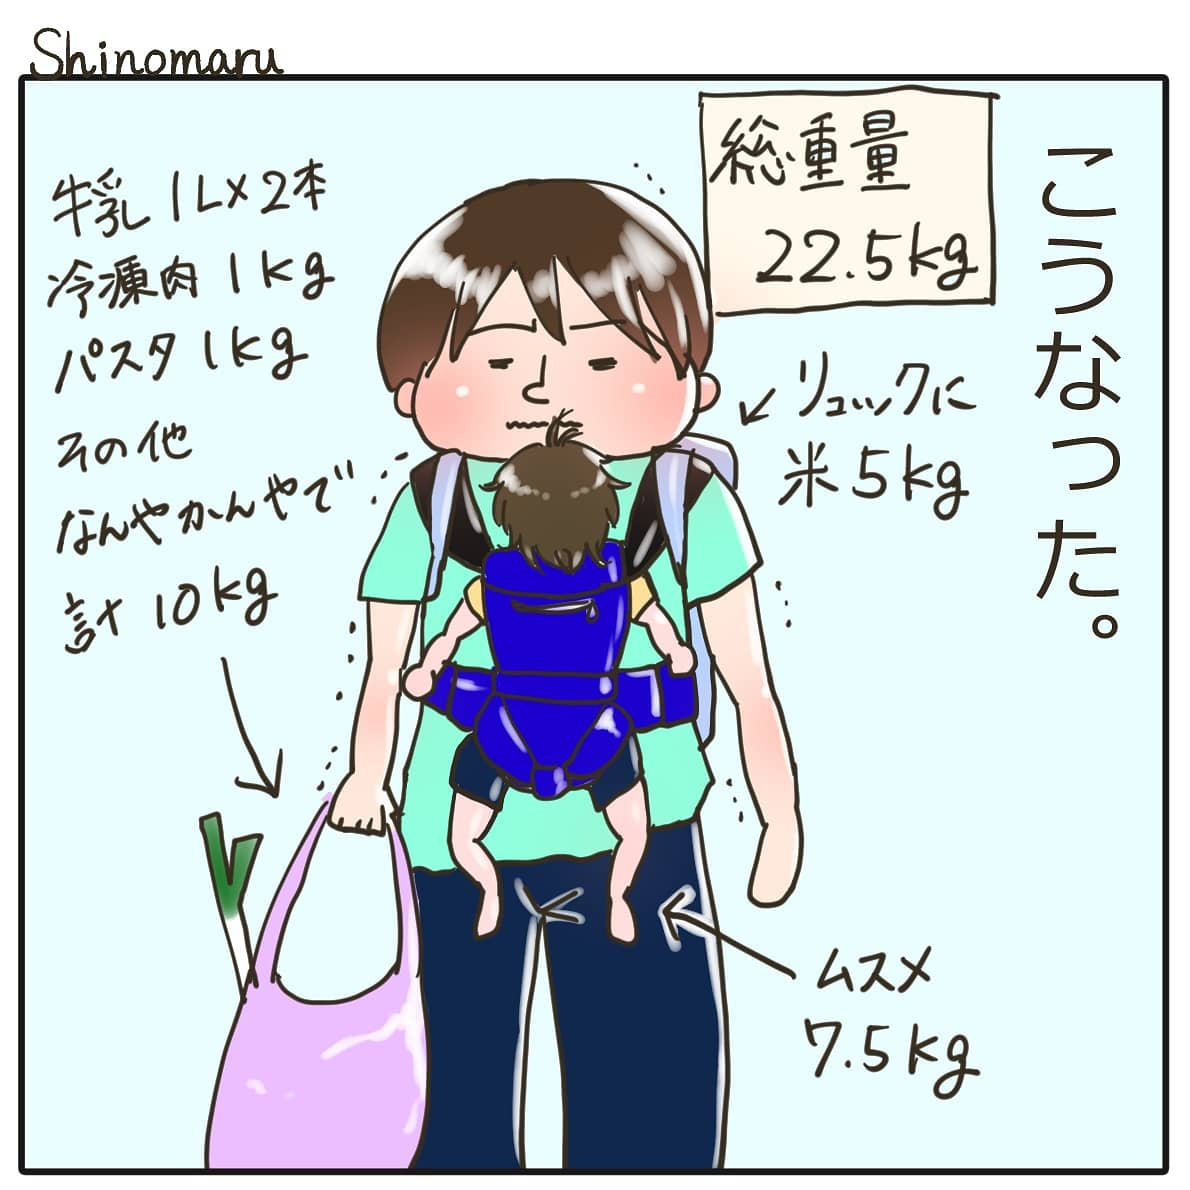 f:id:Shinomaru:20210517185713j:plain